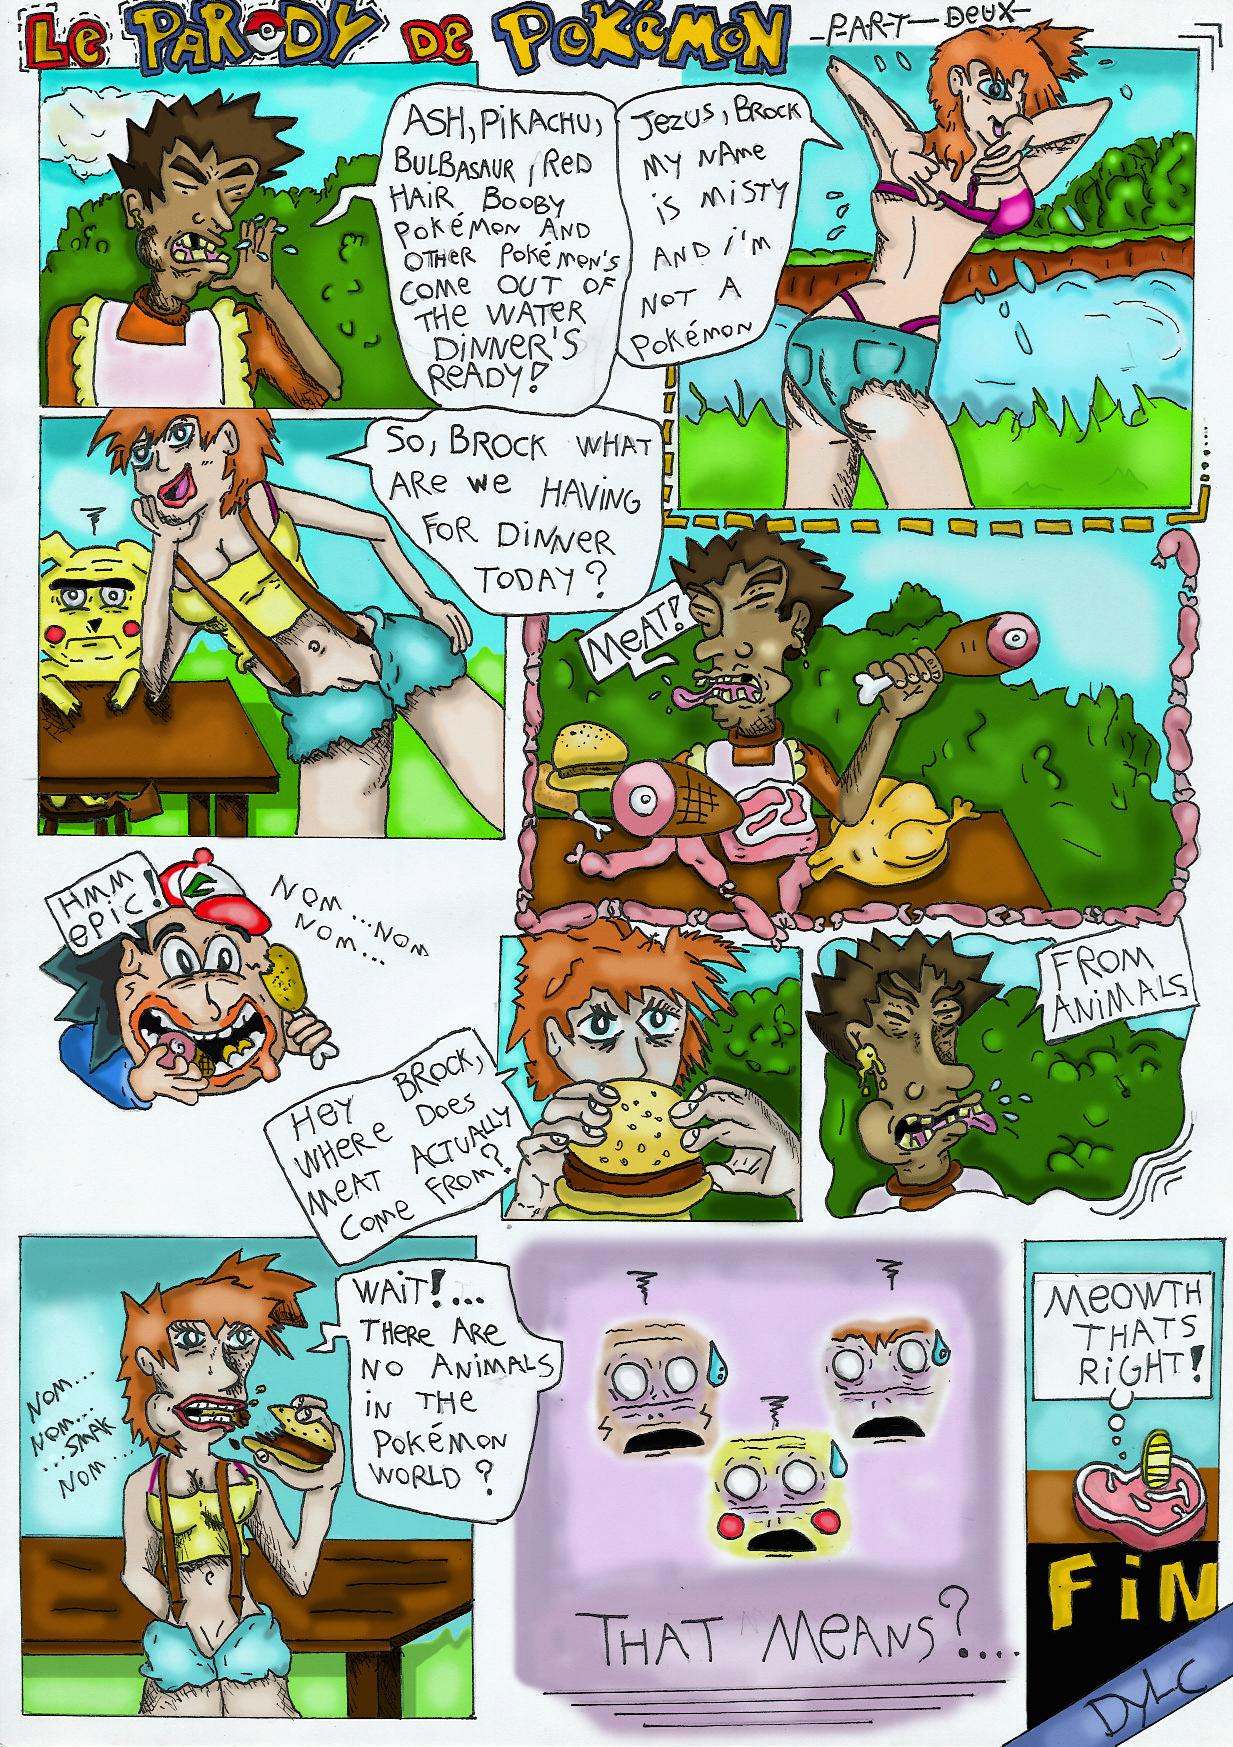 Le parody de pokémon : meat